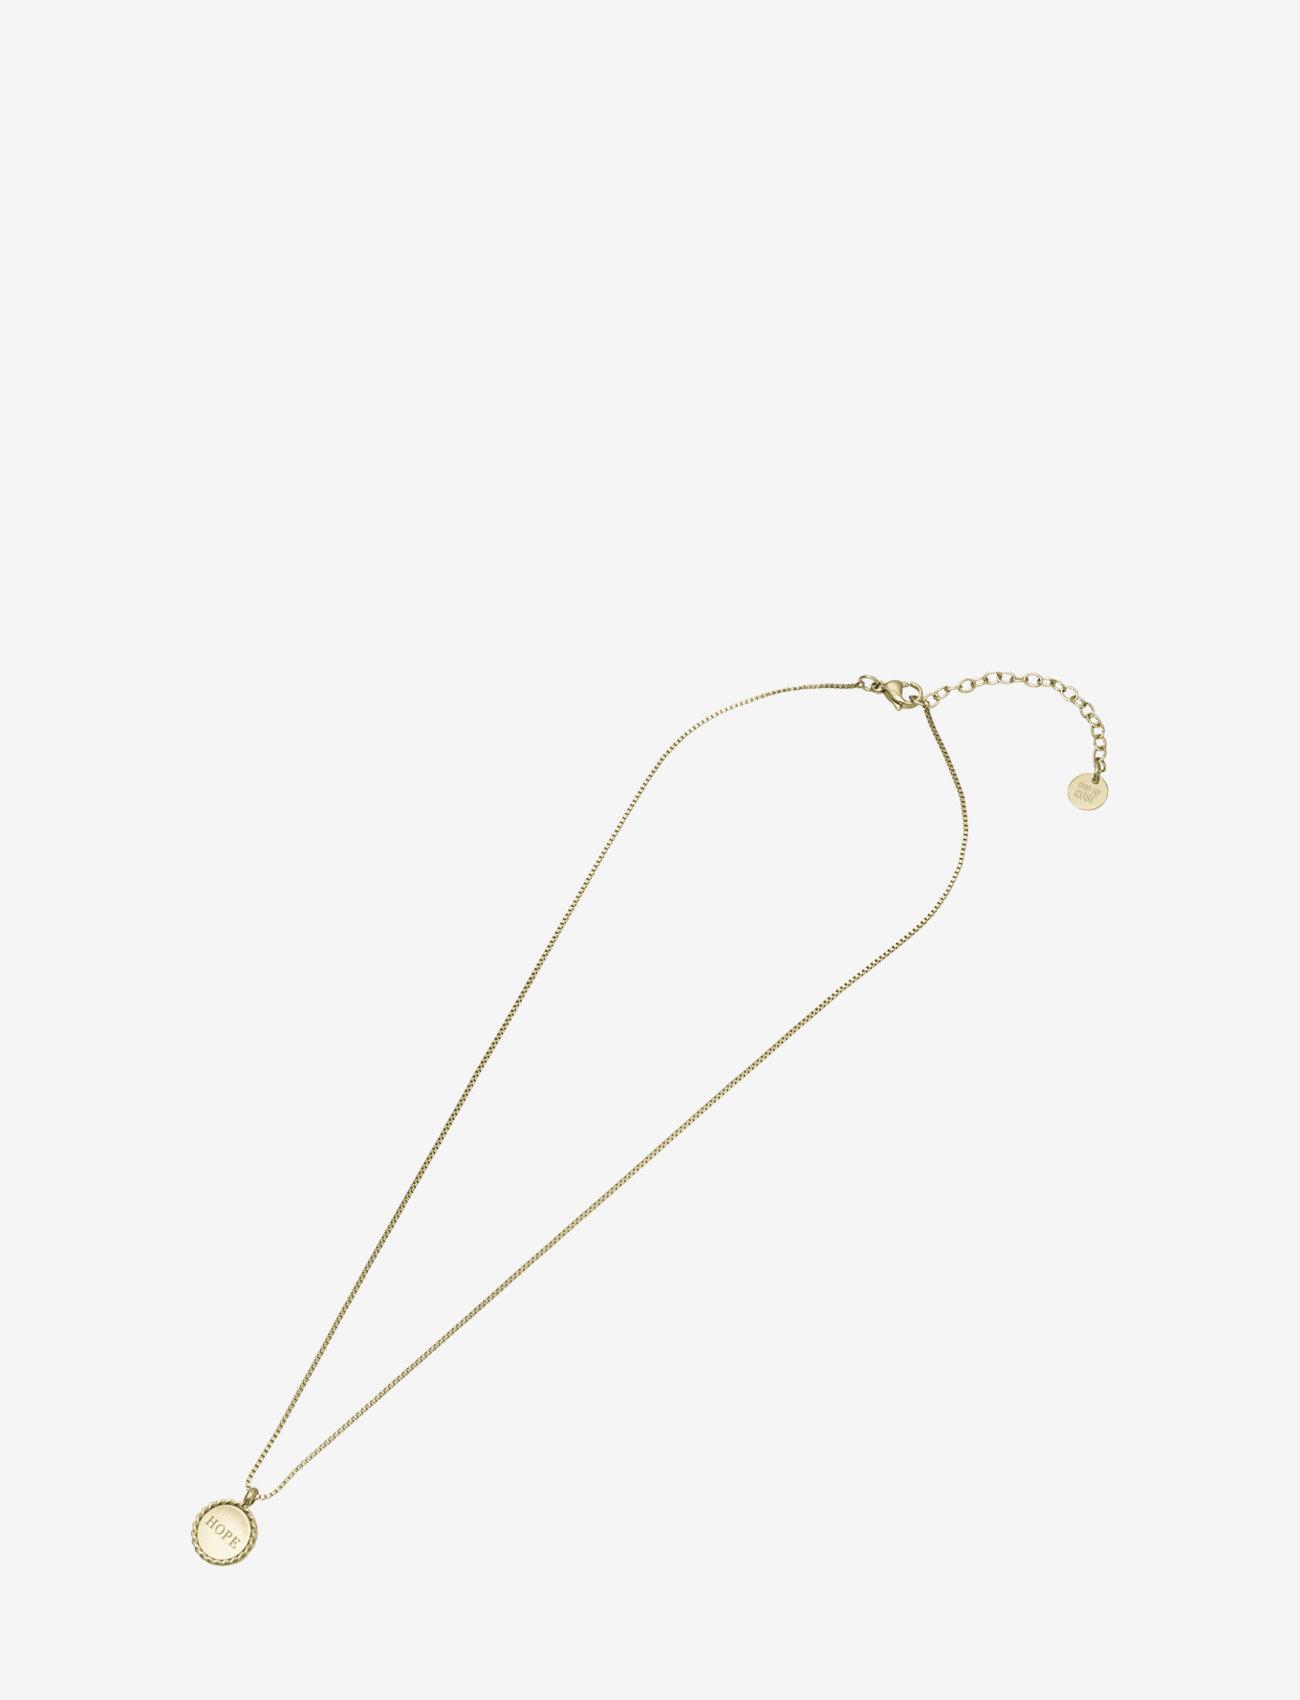 Bud to rose - Hope Short Necklace Steel - kettingen met hanger - gold - 1